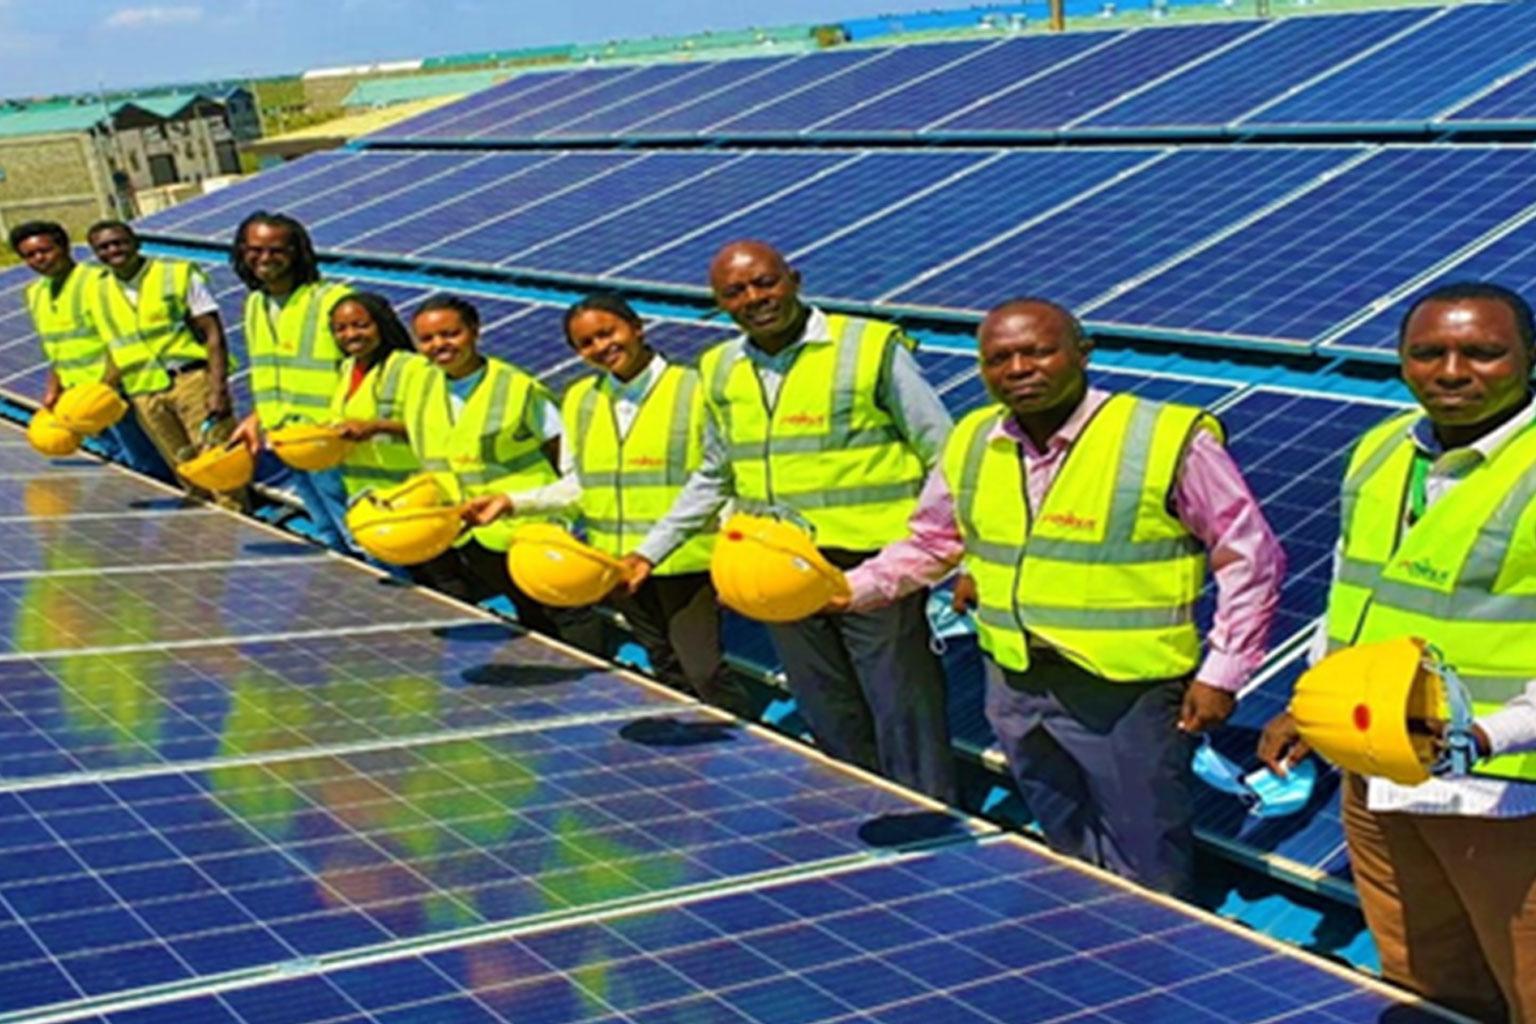 MMU to train energy technicians under Kenya Off-Grid Solar Access Project